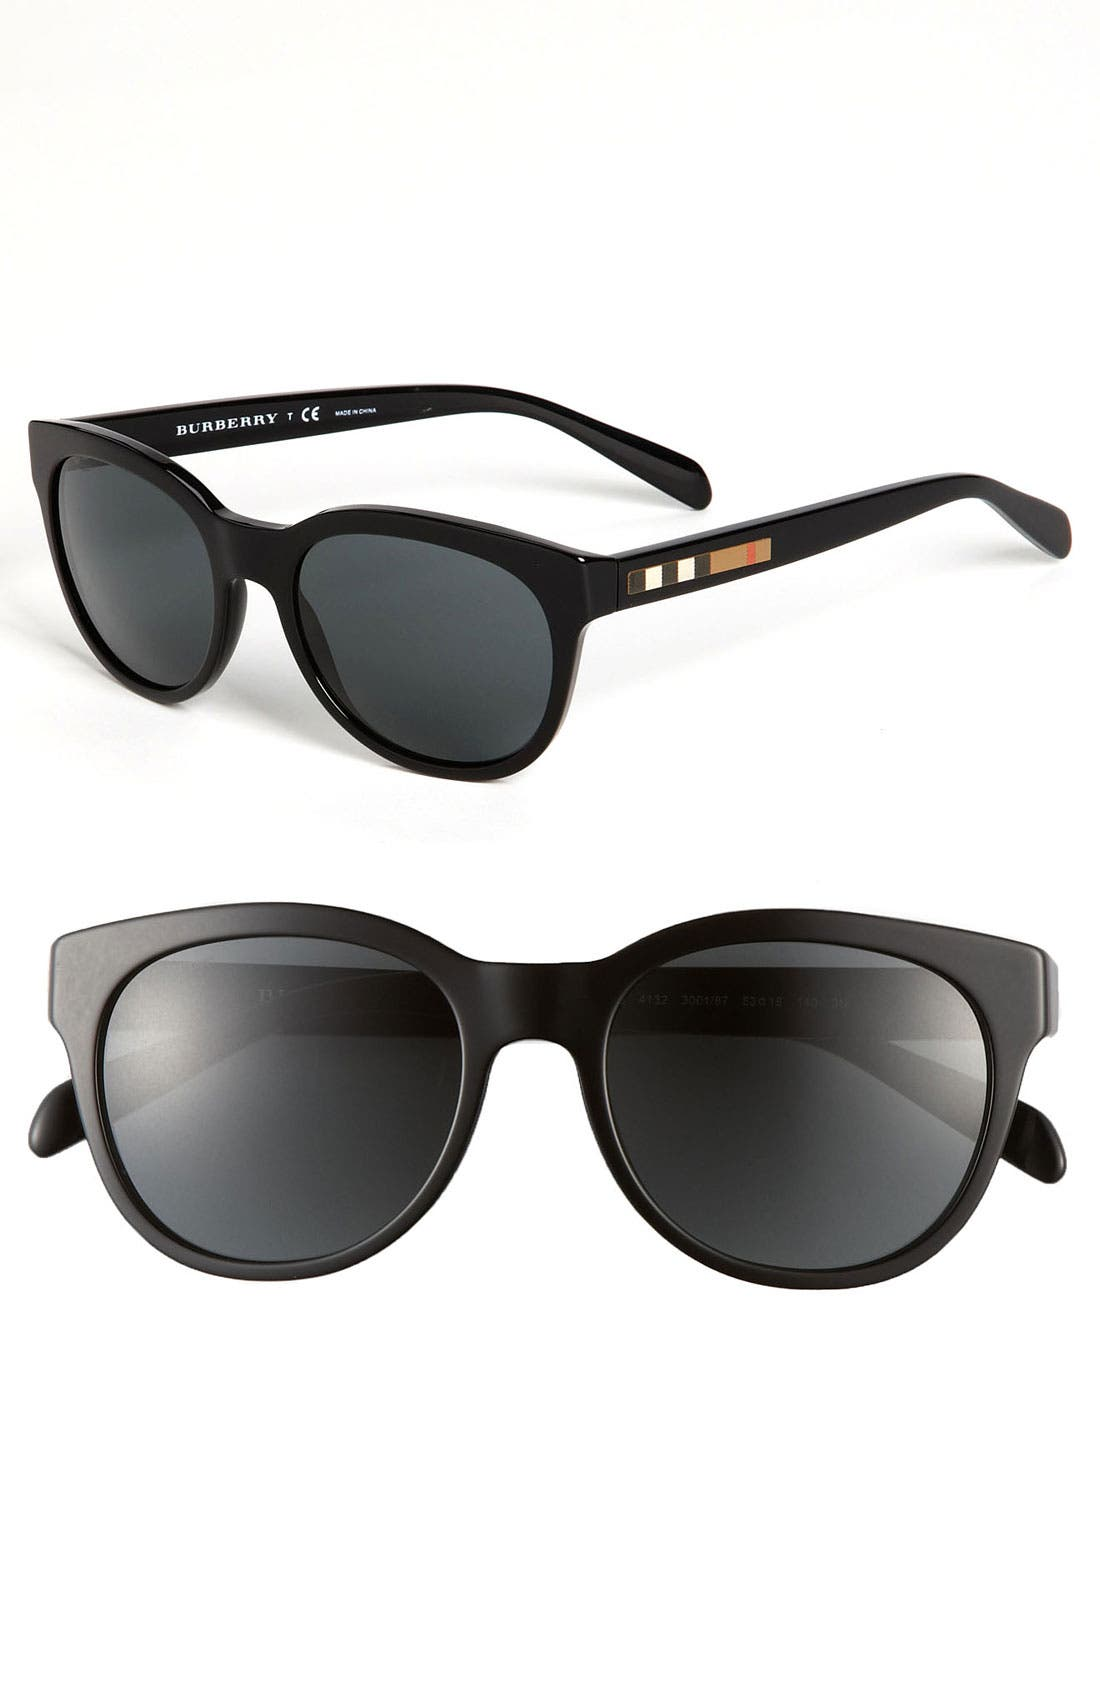 Main Image - Burberry Sunglasses